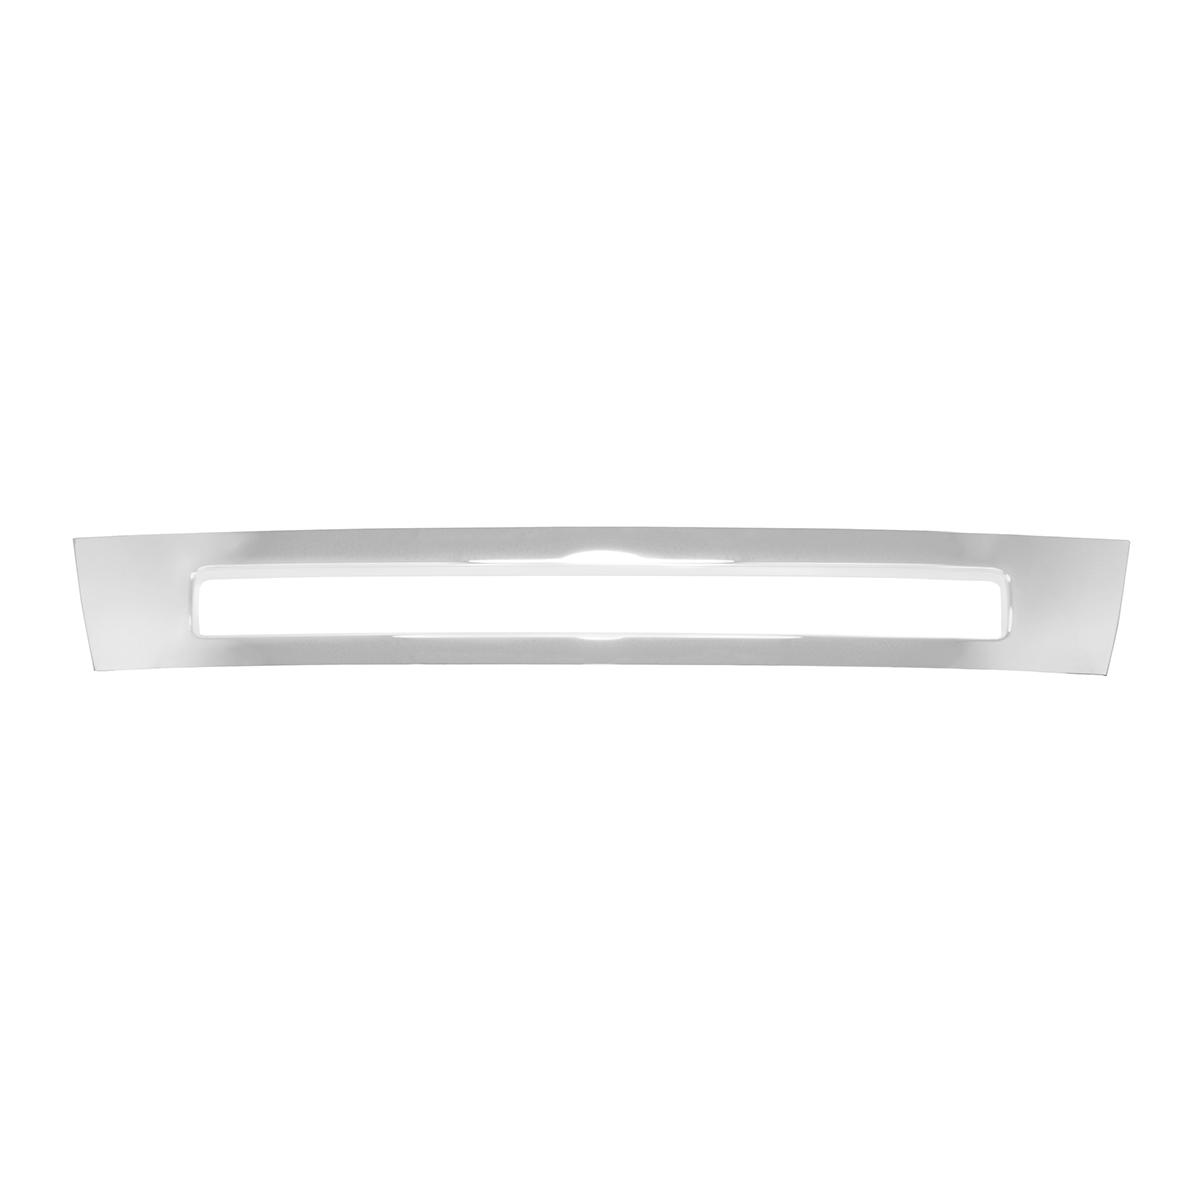 89323 Chrome Plastic Center Front Bumper Cover for Volvo